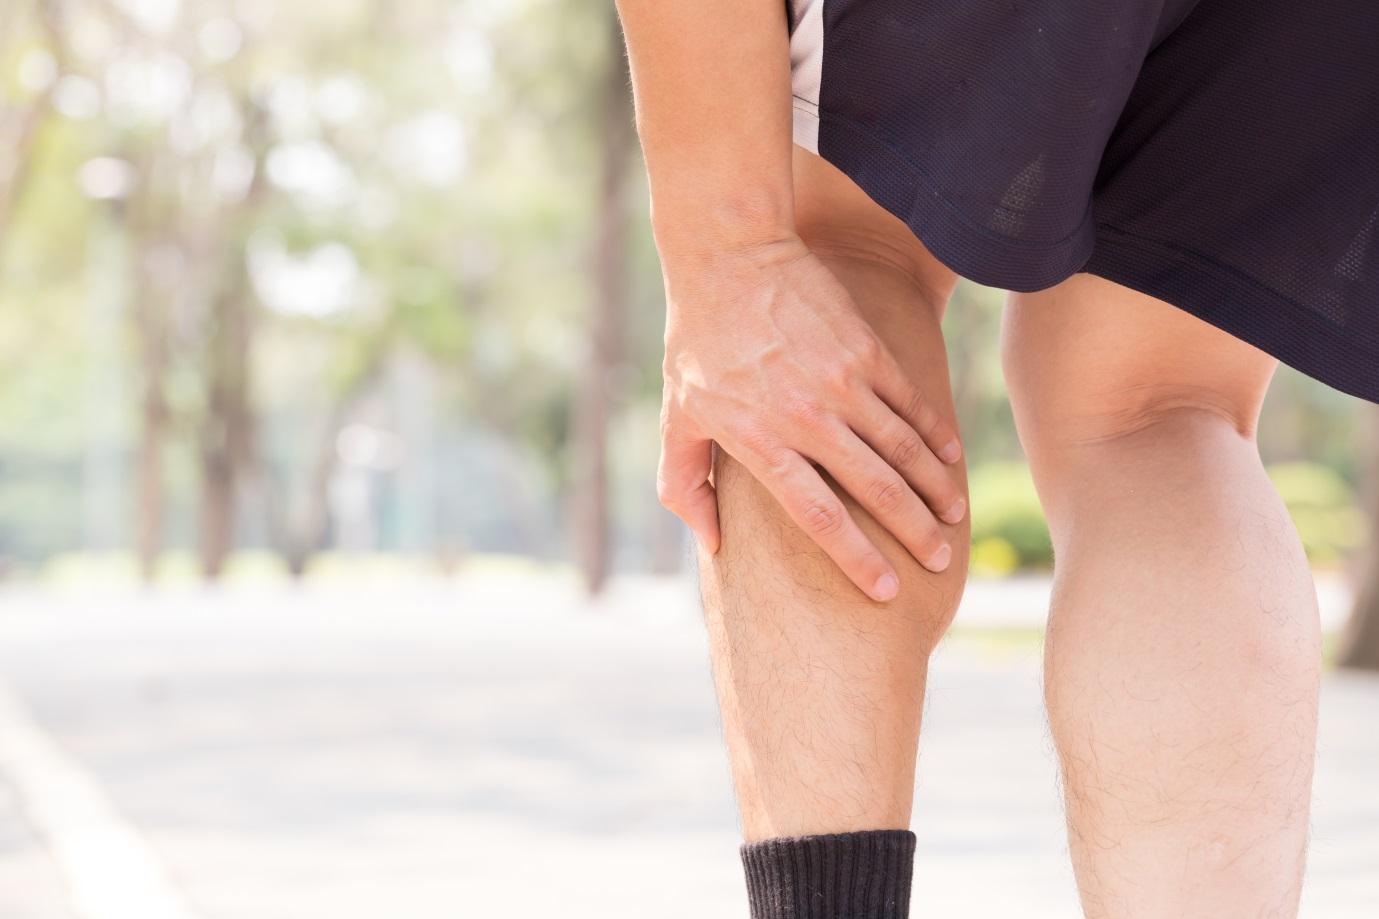 5 Bagian Tubuh Rawan Cidera yang Bisa Bikin Nyeri Otot